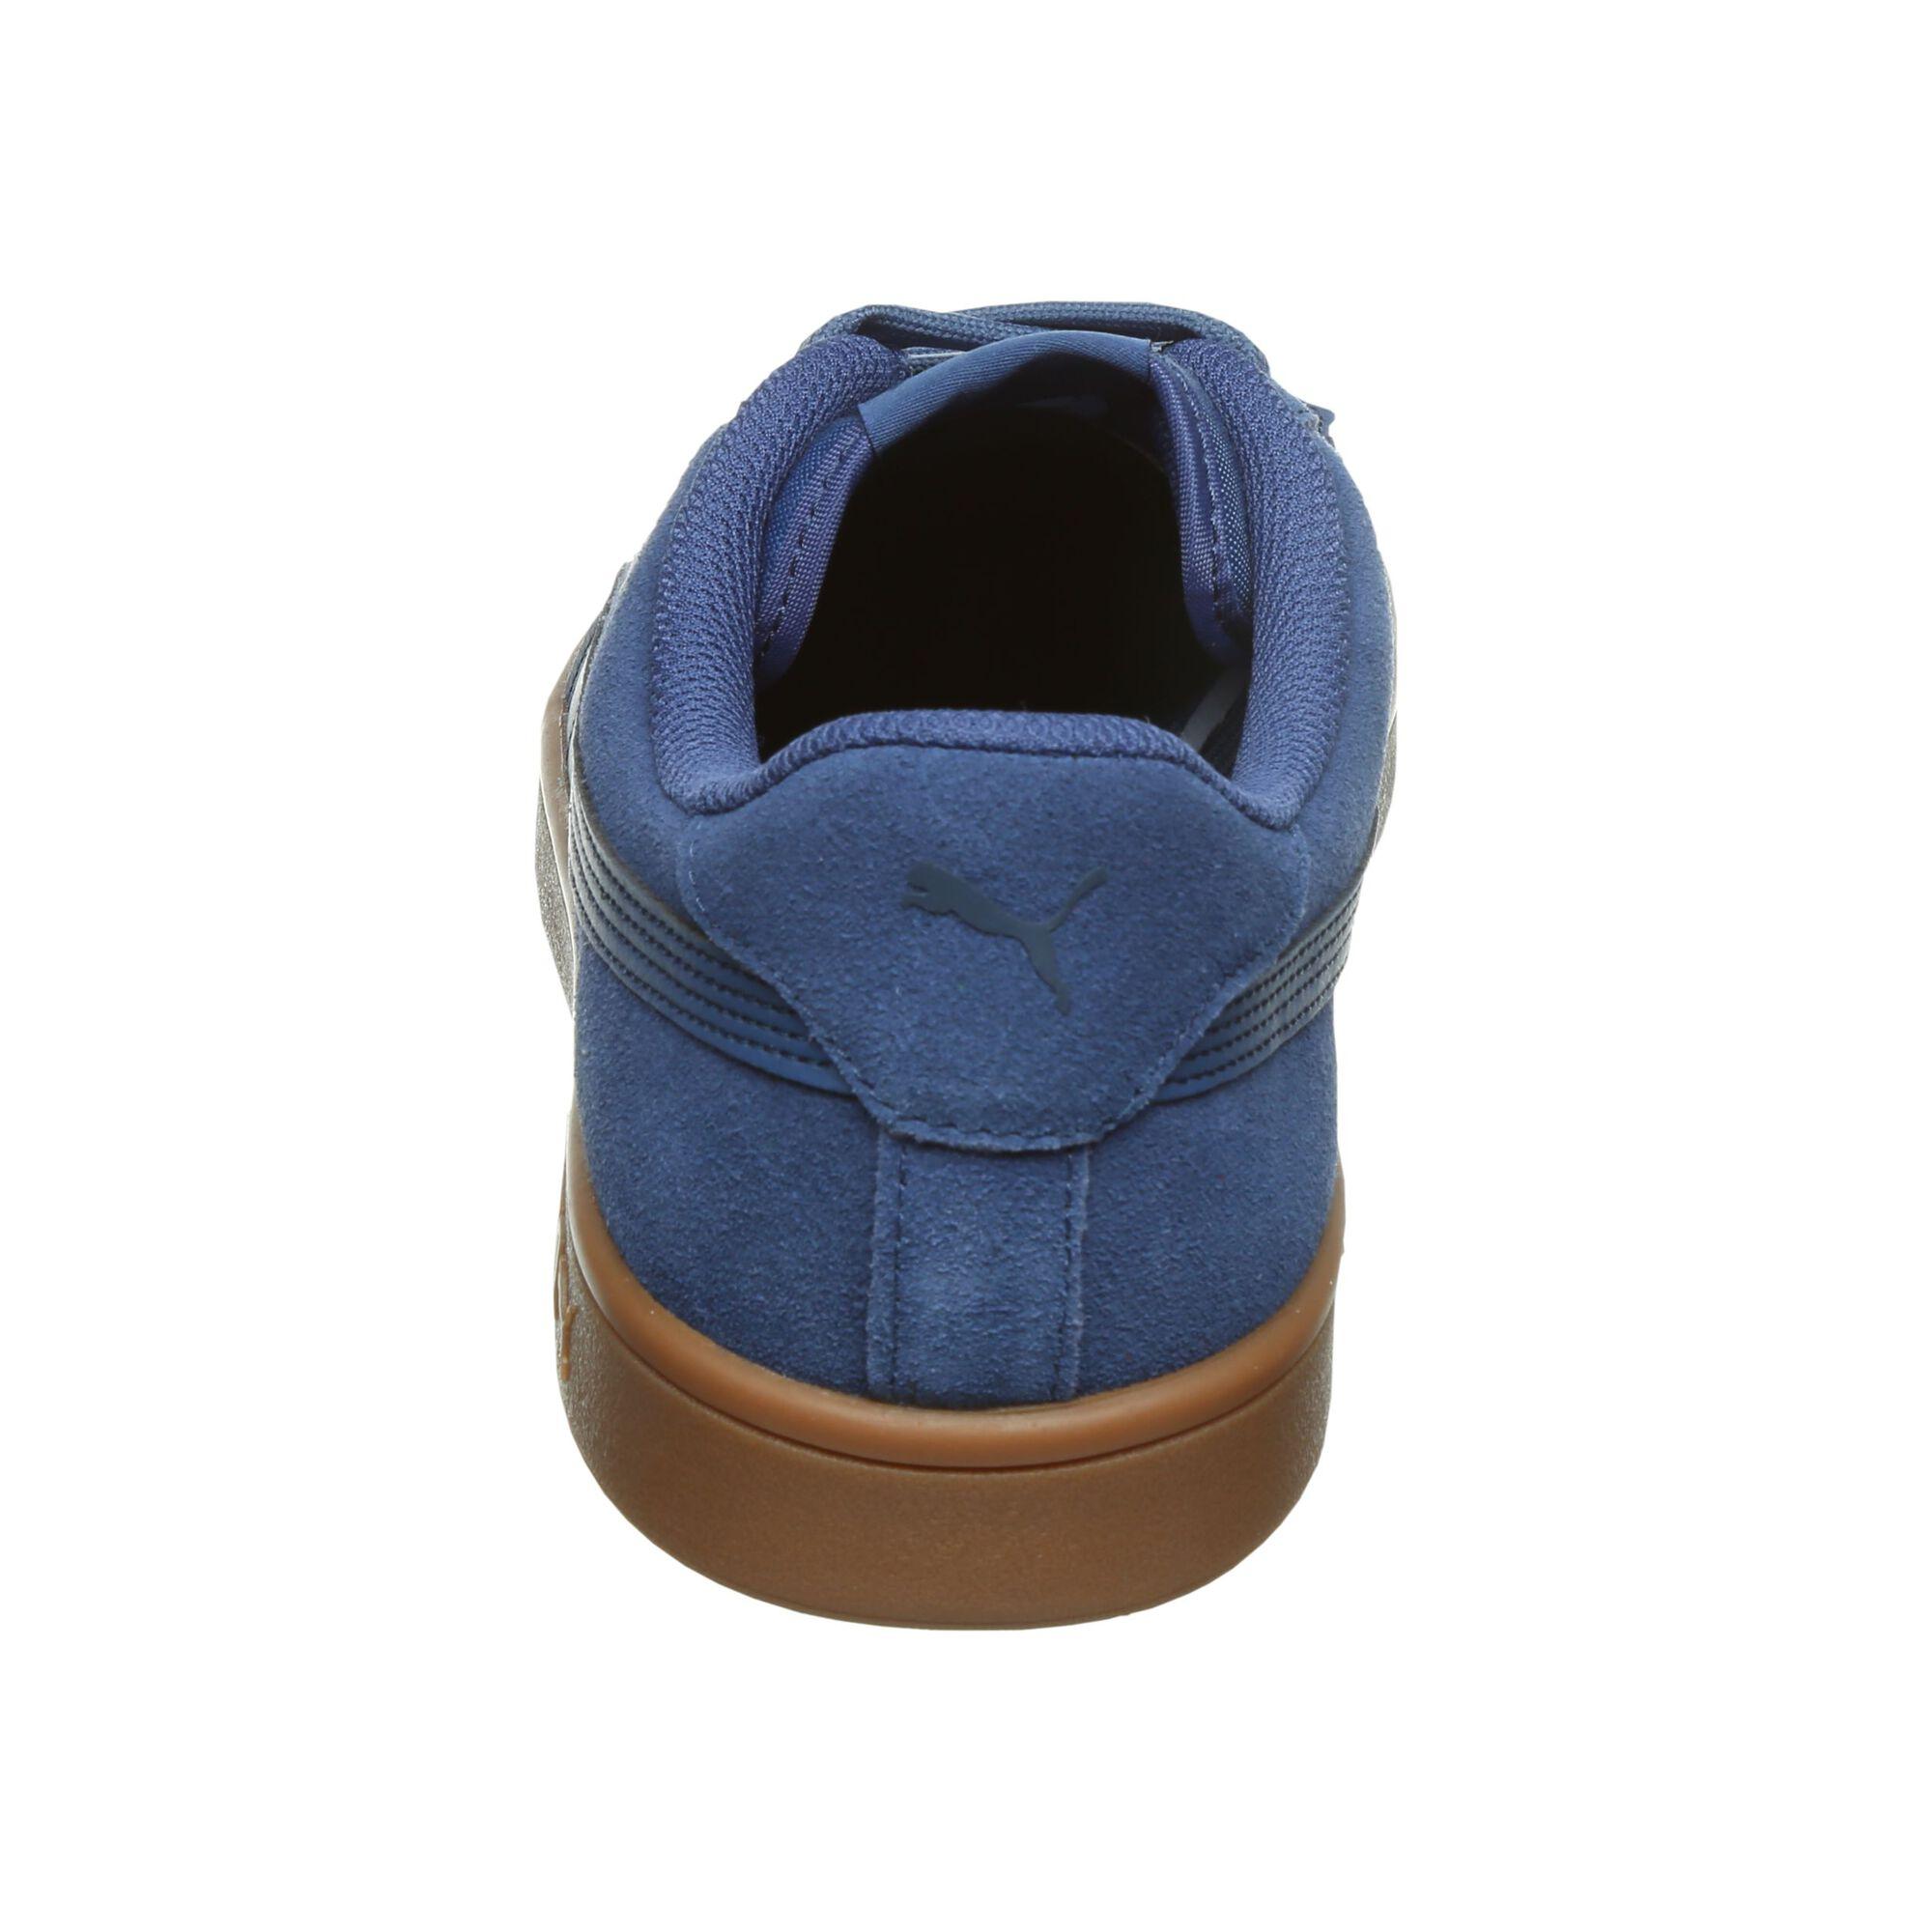 d54cfbbe7737 buy Puma Smash V2 Sneakers Men - Dark Blue